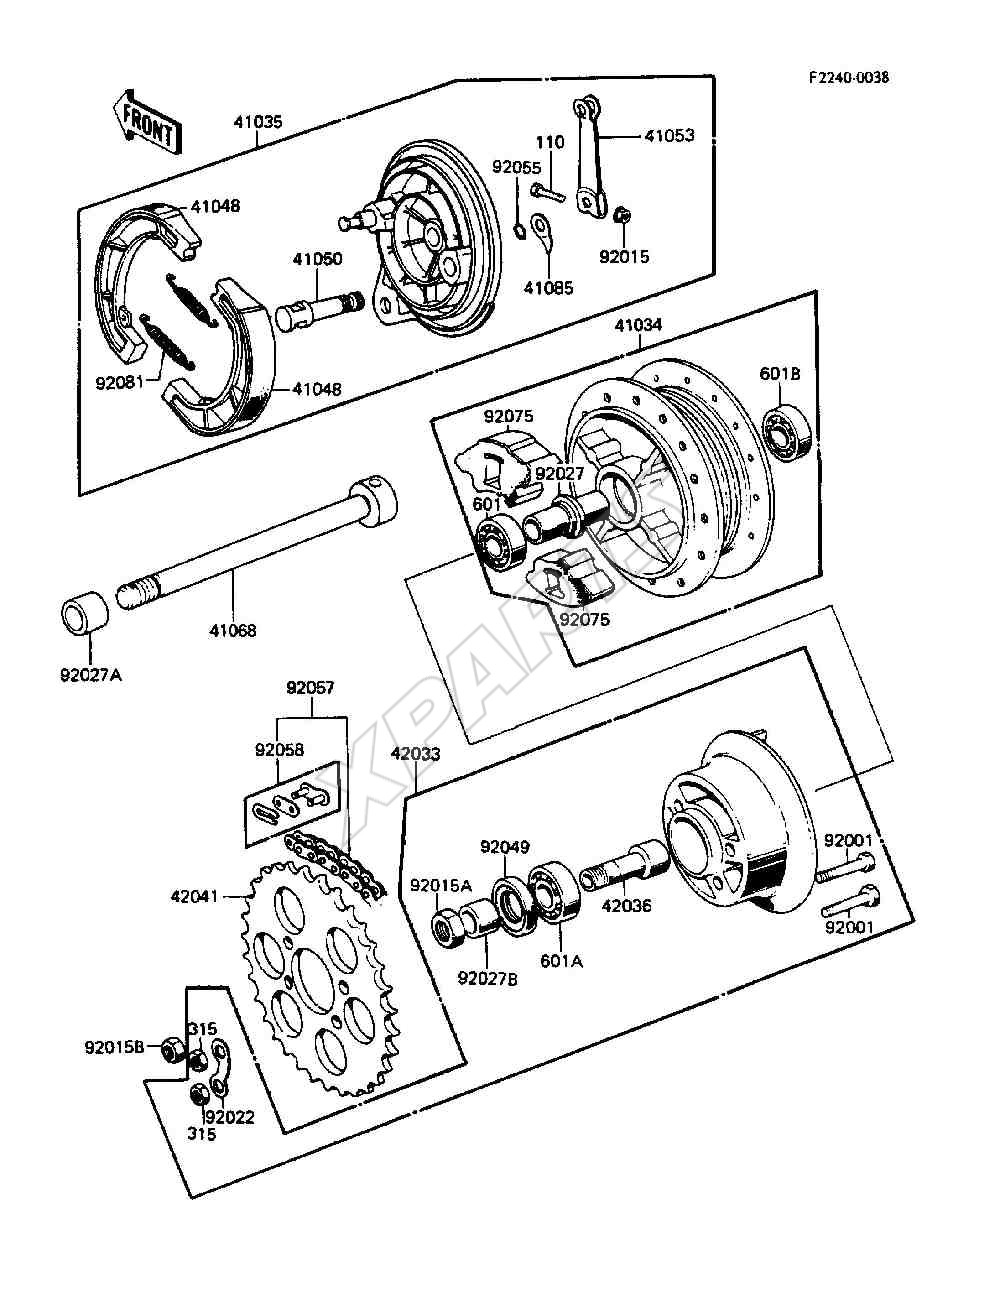 2006 Suzuki Aerio Fuse Box. Suzuki. Auto Wiring Diagram